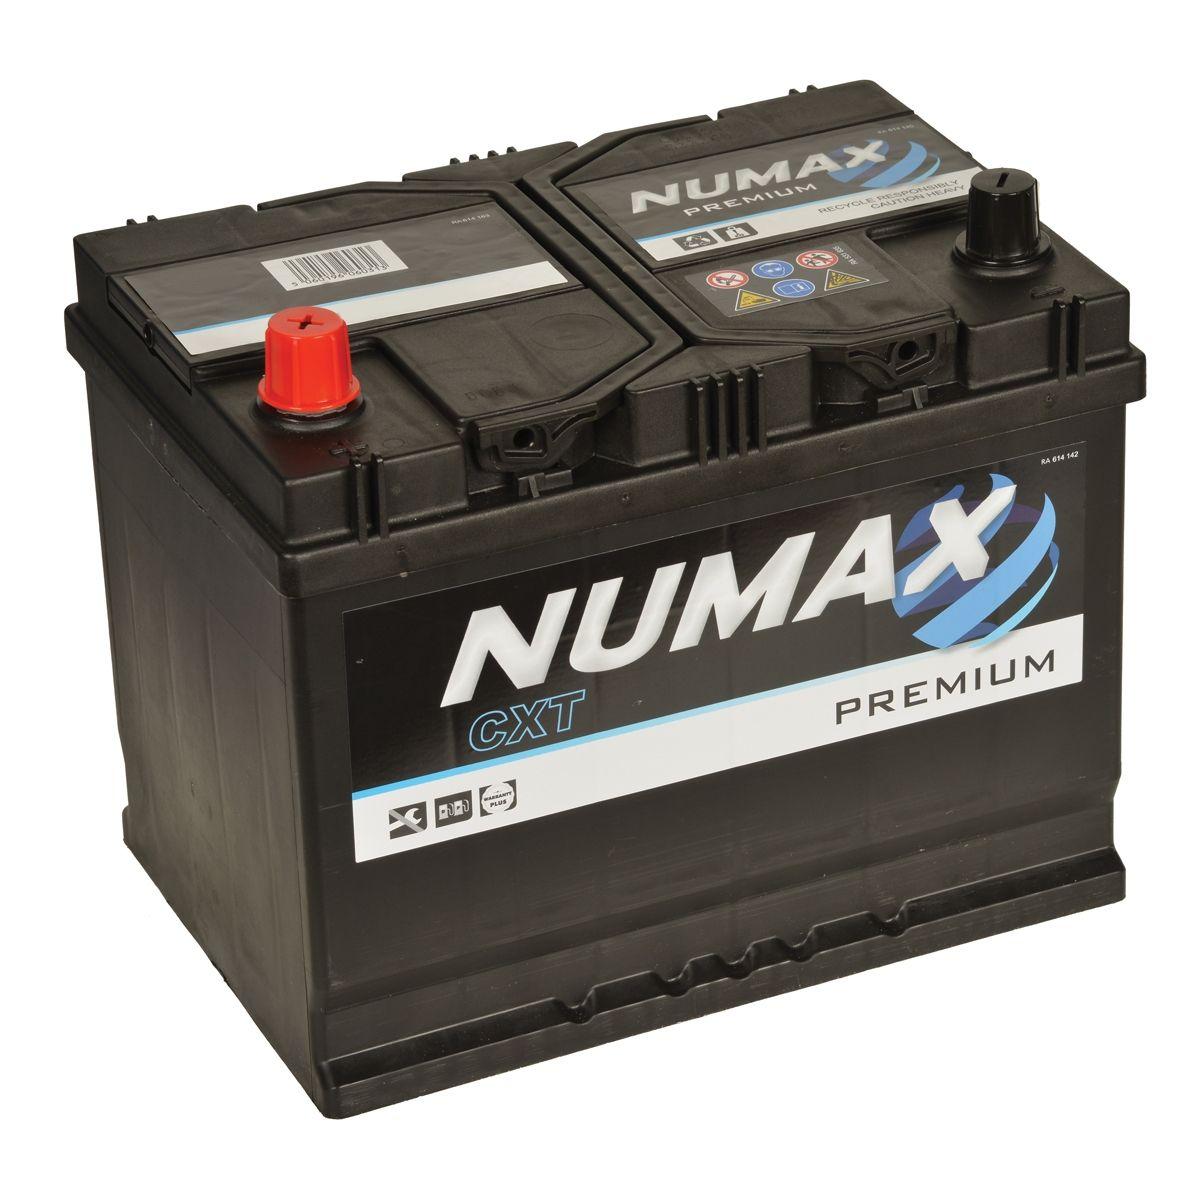 Reviews 072 Numax Car Battery 12v 70ah Page 1